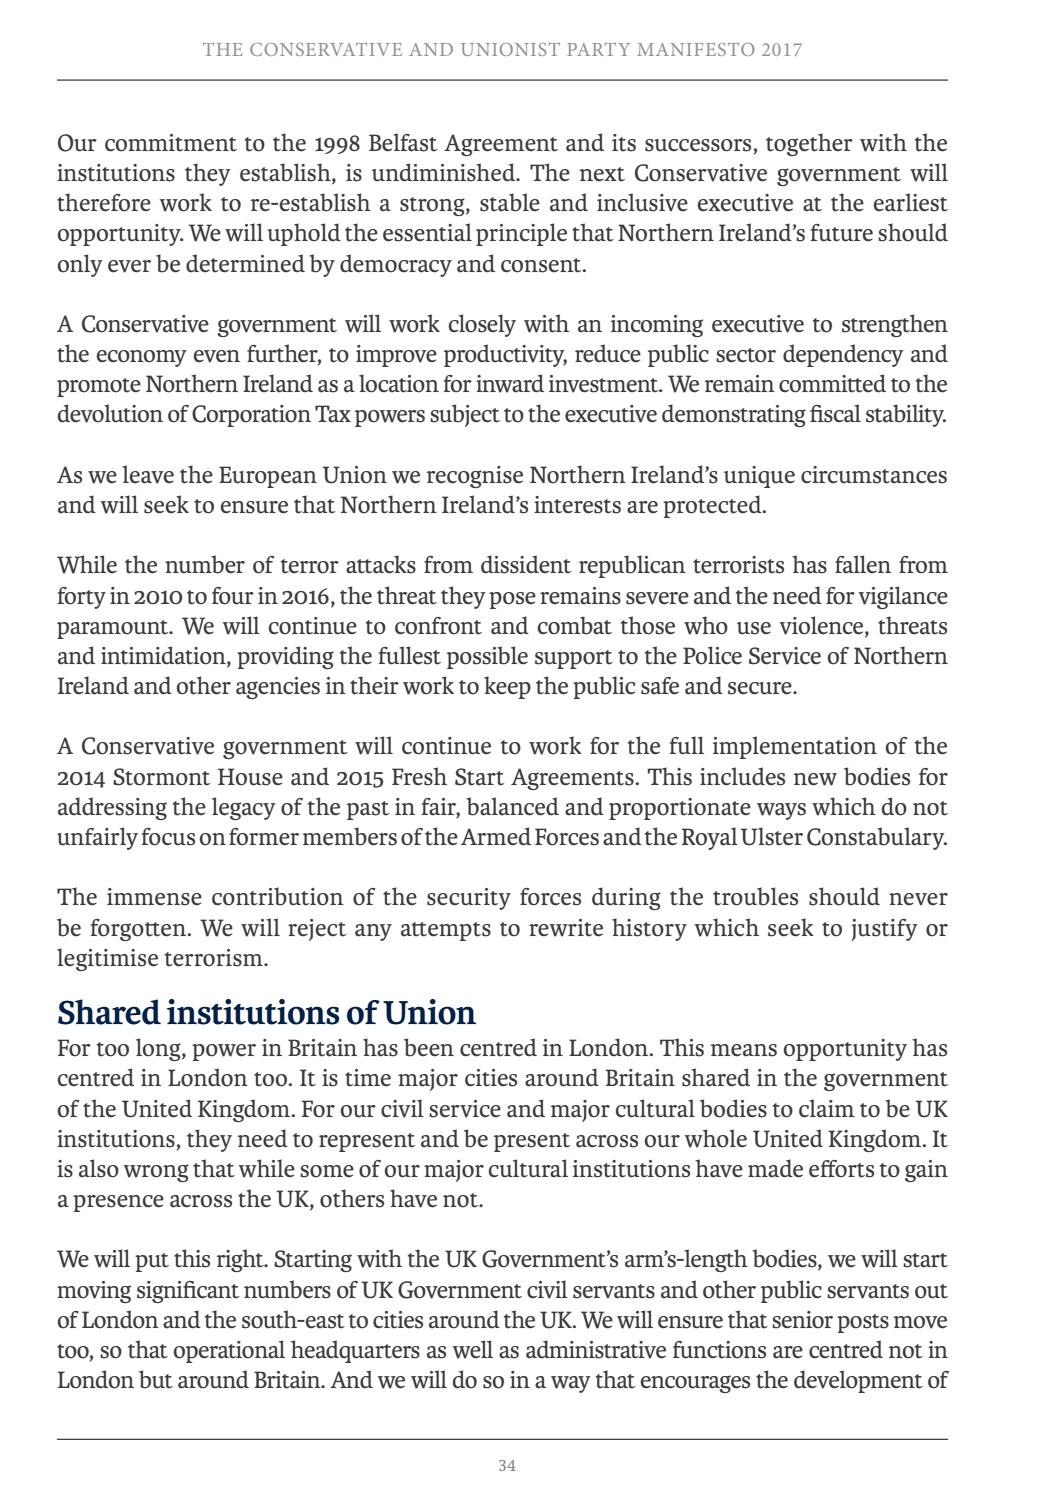 Conservative party manifesto 2010 pdf